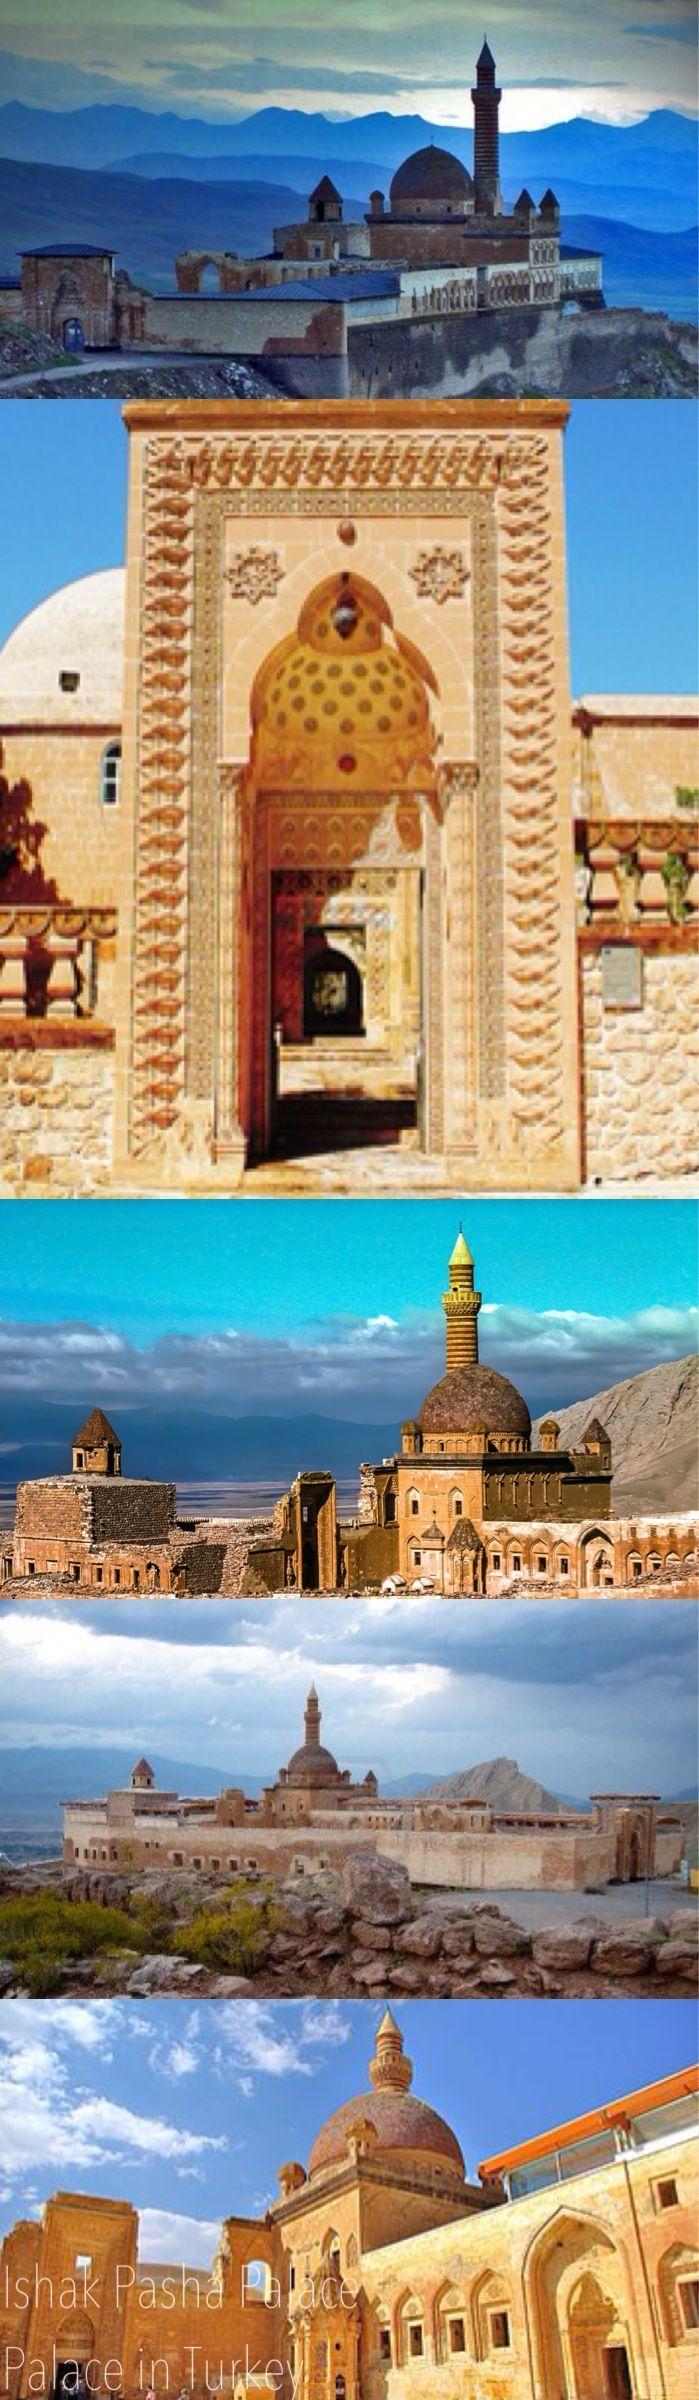 Beautiful Highlights/Views of Ishak Pasha Palace